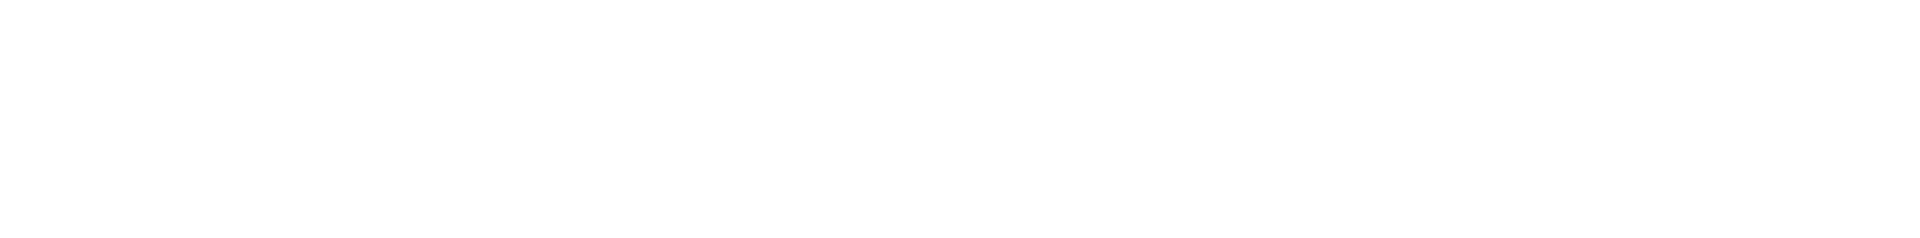 logo color blanco mabel katz